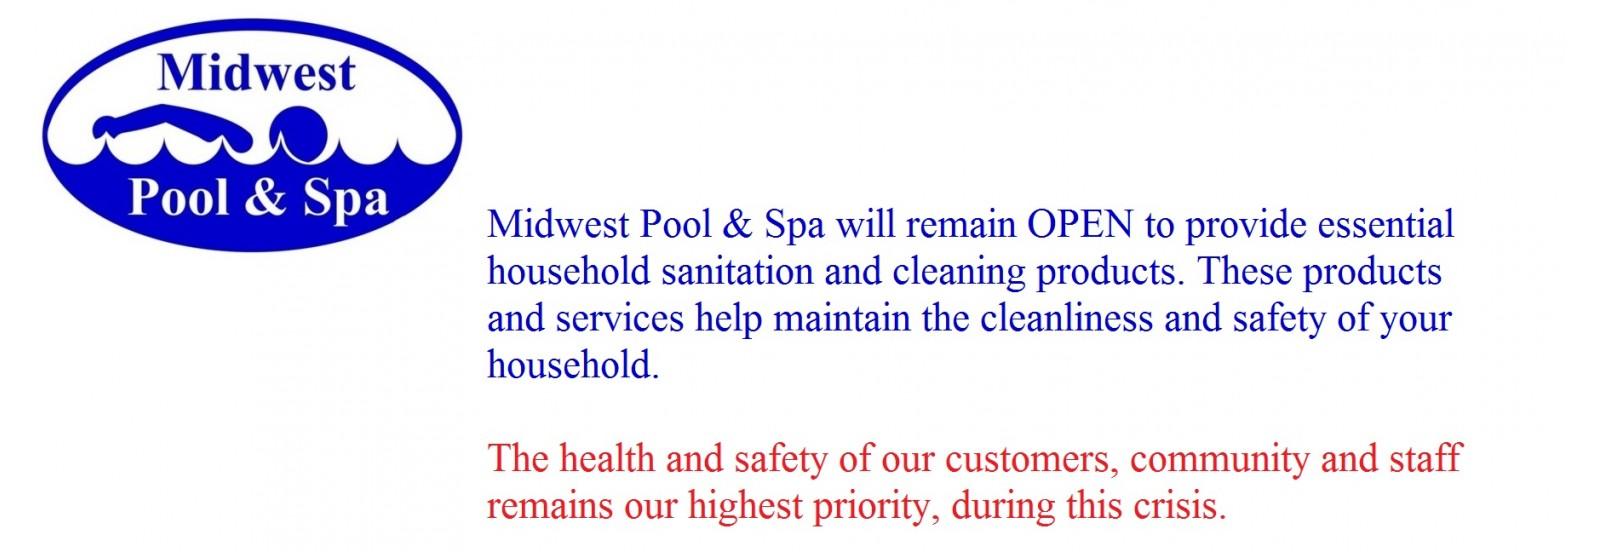 COVID-19 Sanitation Products